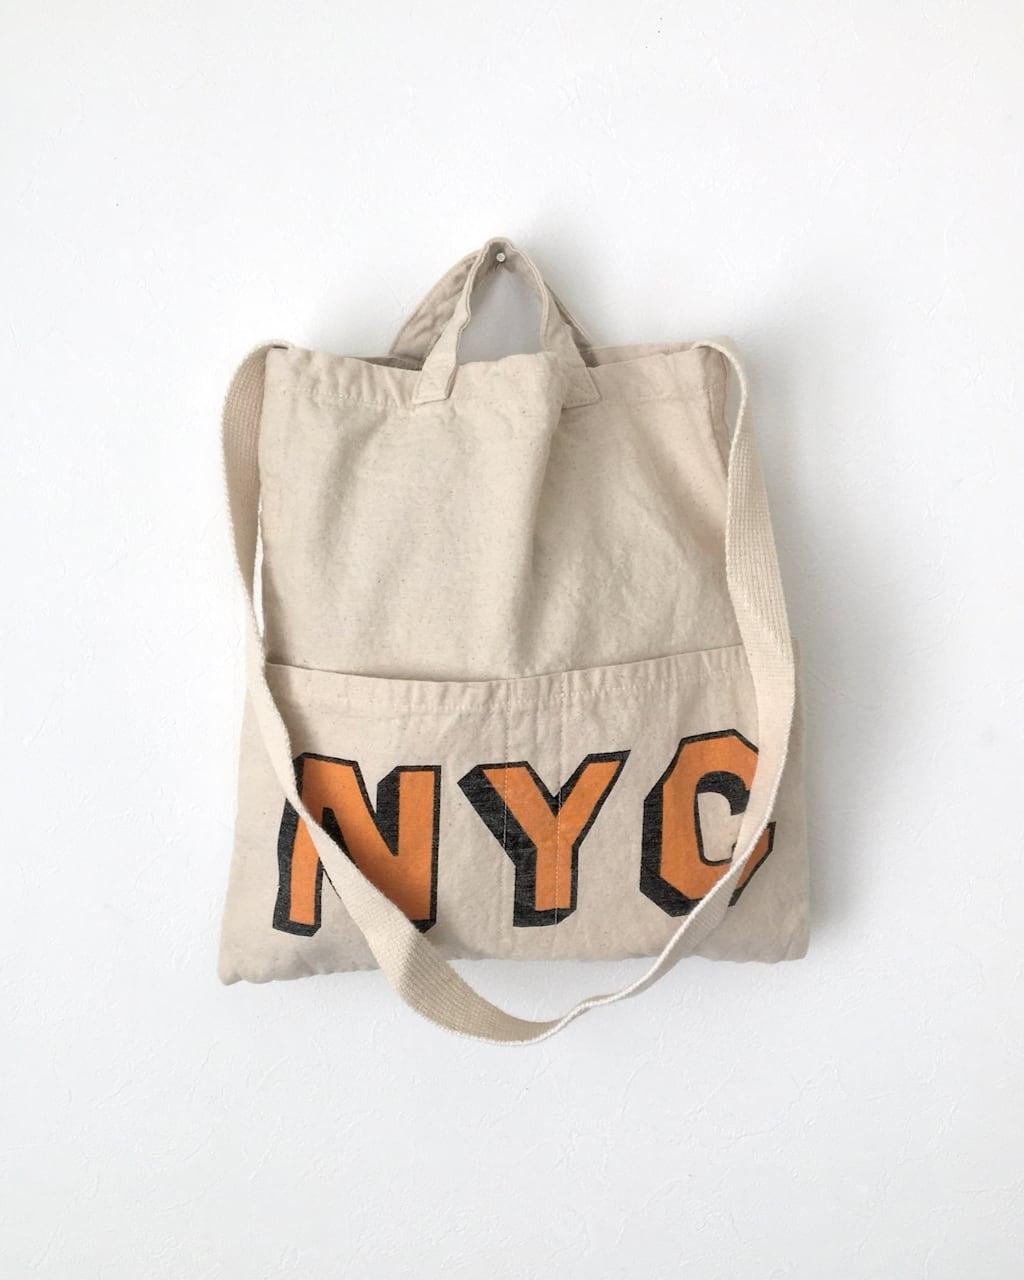 Twill Bag NYC|コットンツイルバッグ NYC